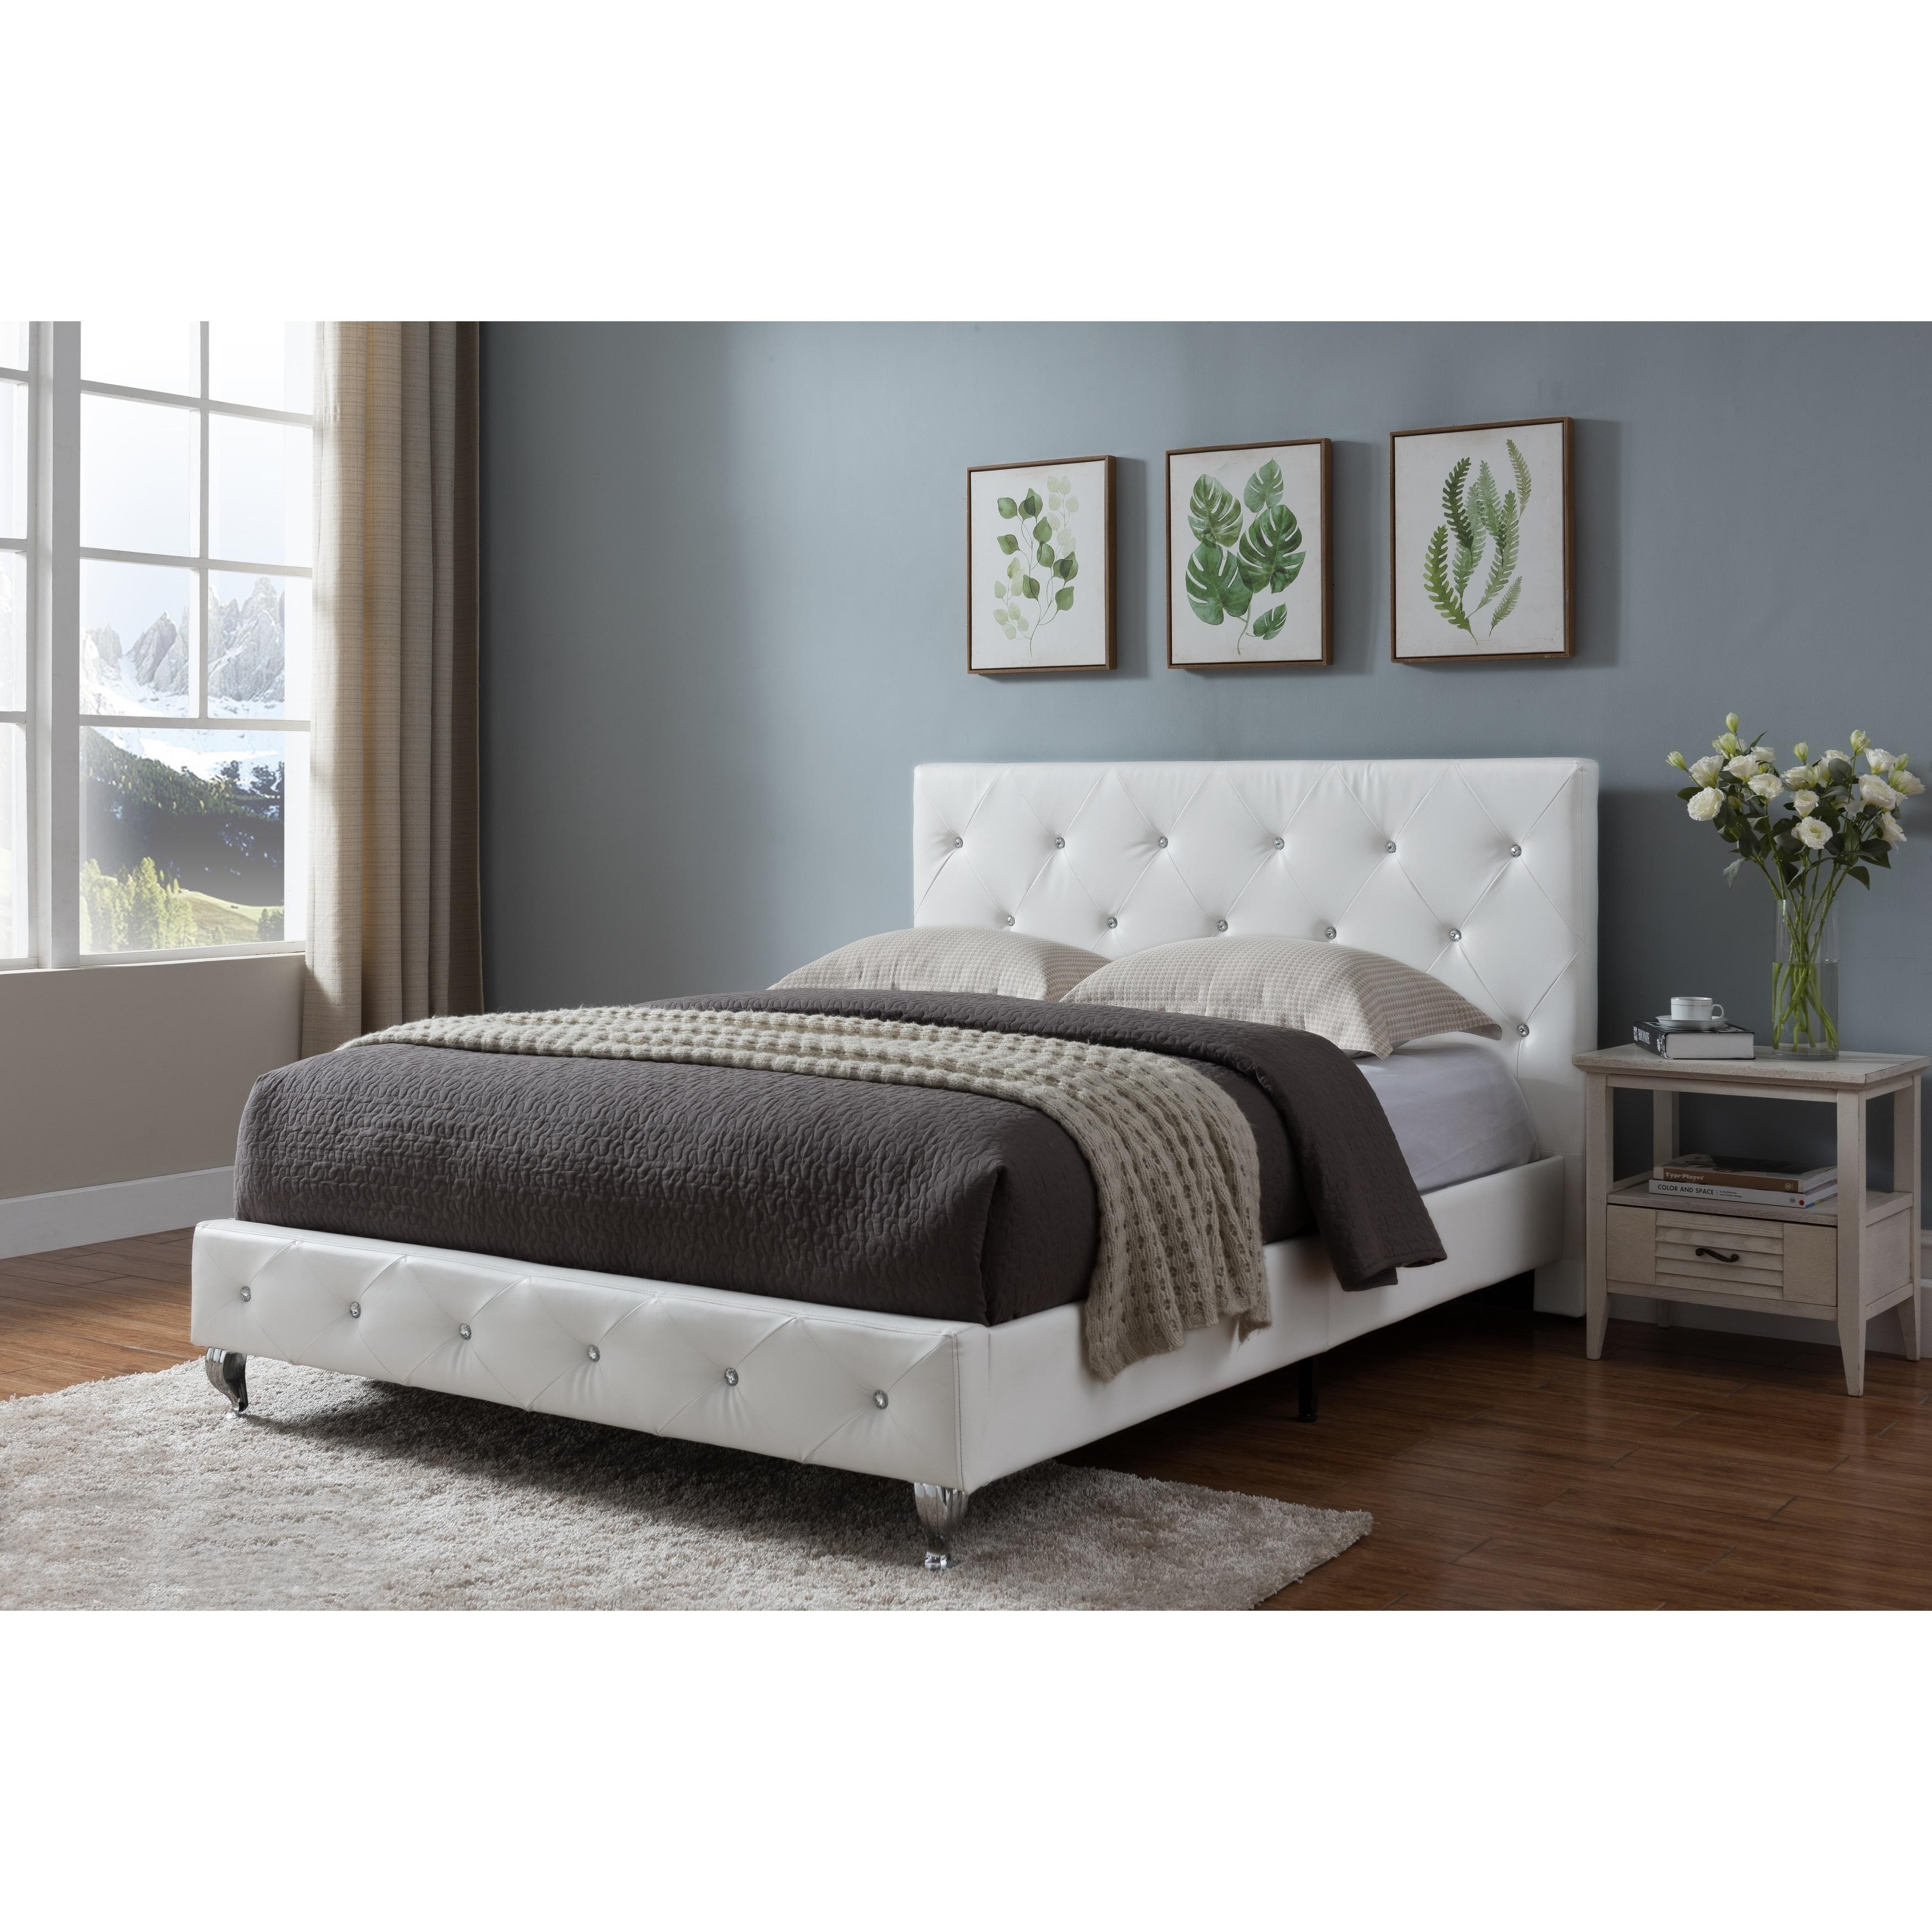 Full Size Upholstered Beds White